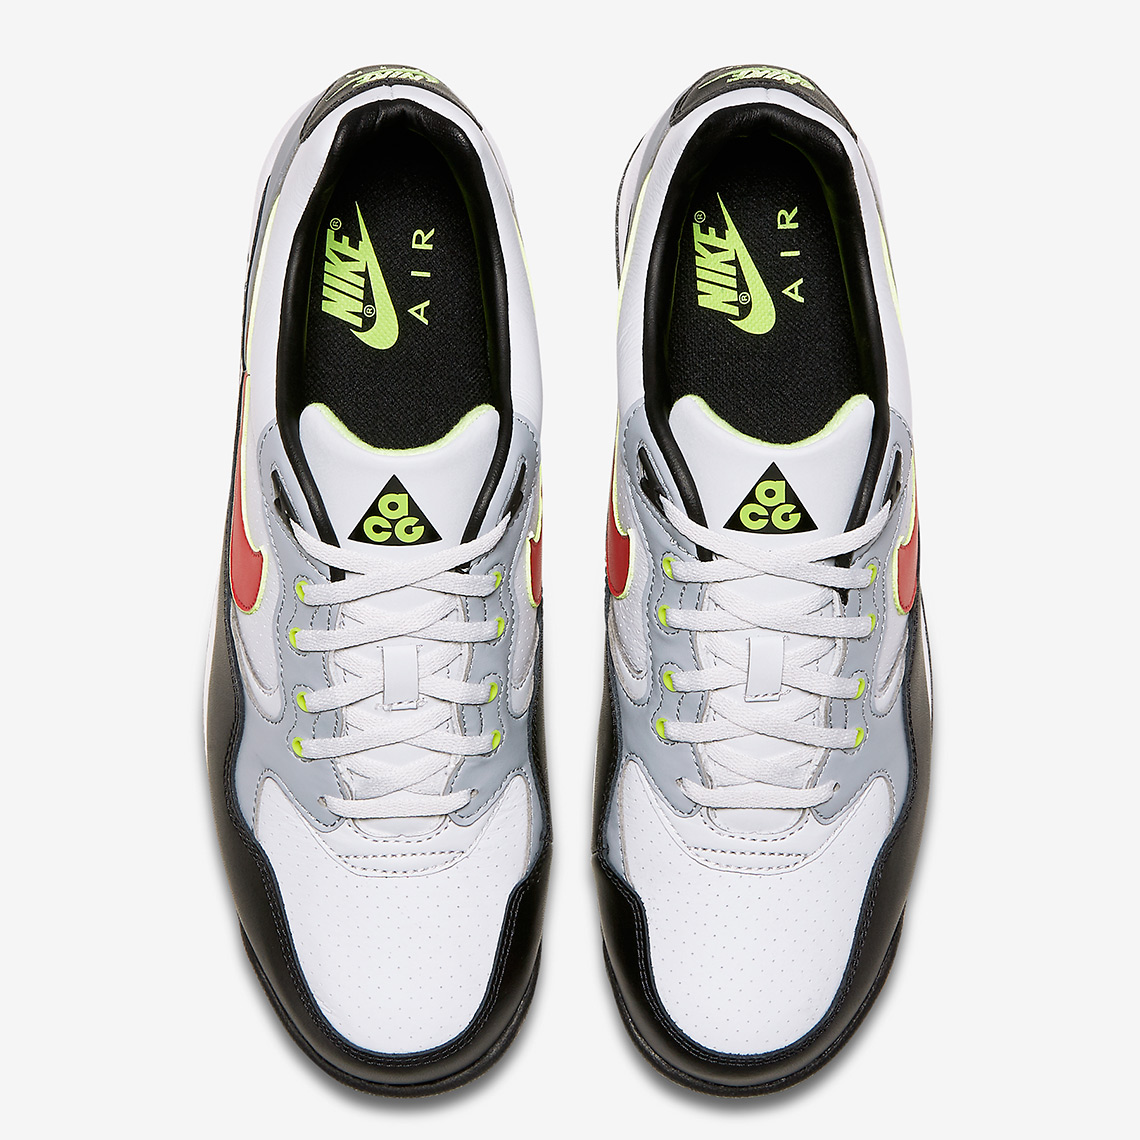 f5e170cfb5e71 Nike ACG Wildwood Release Date  January 24th